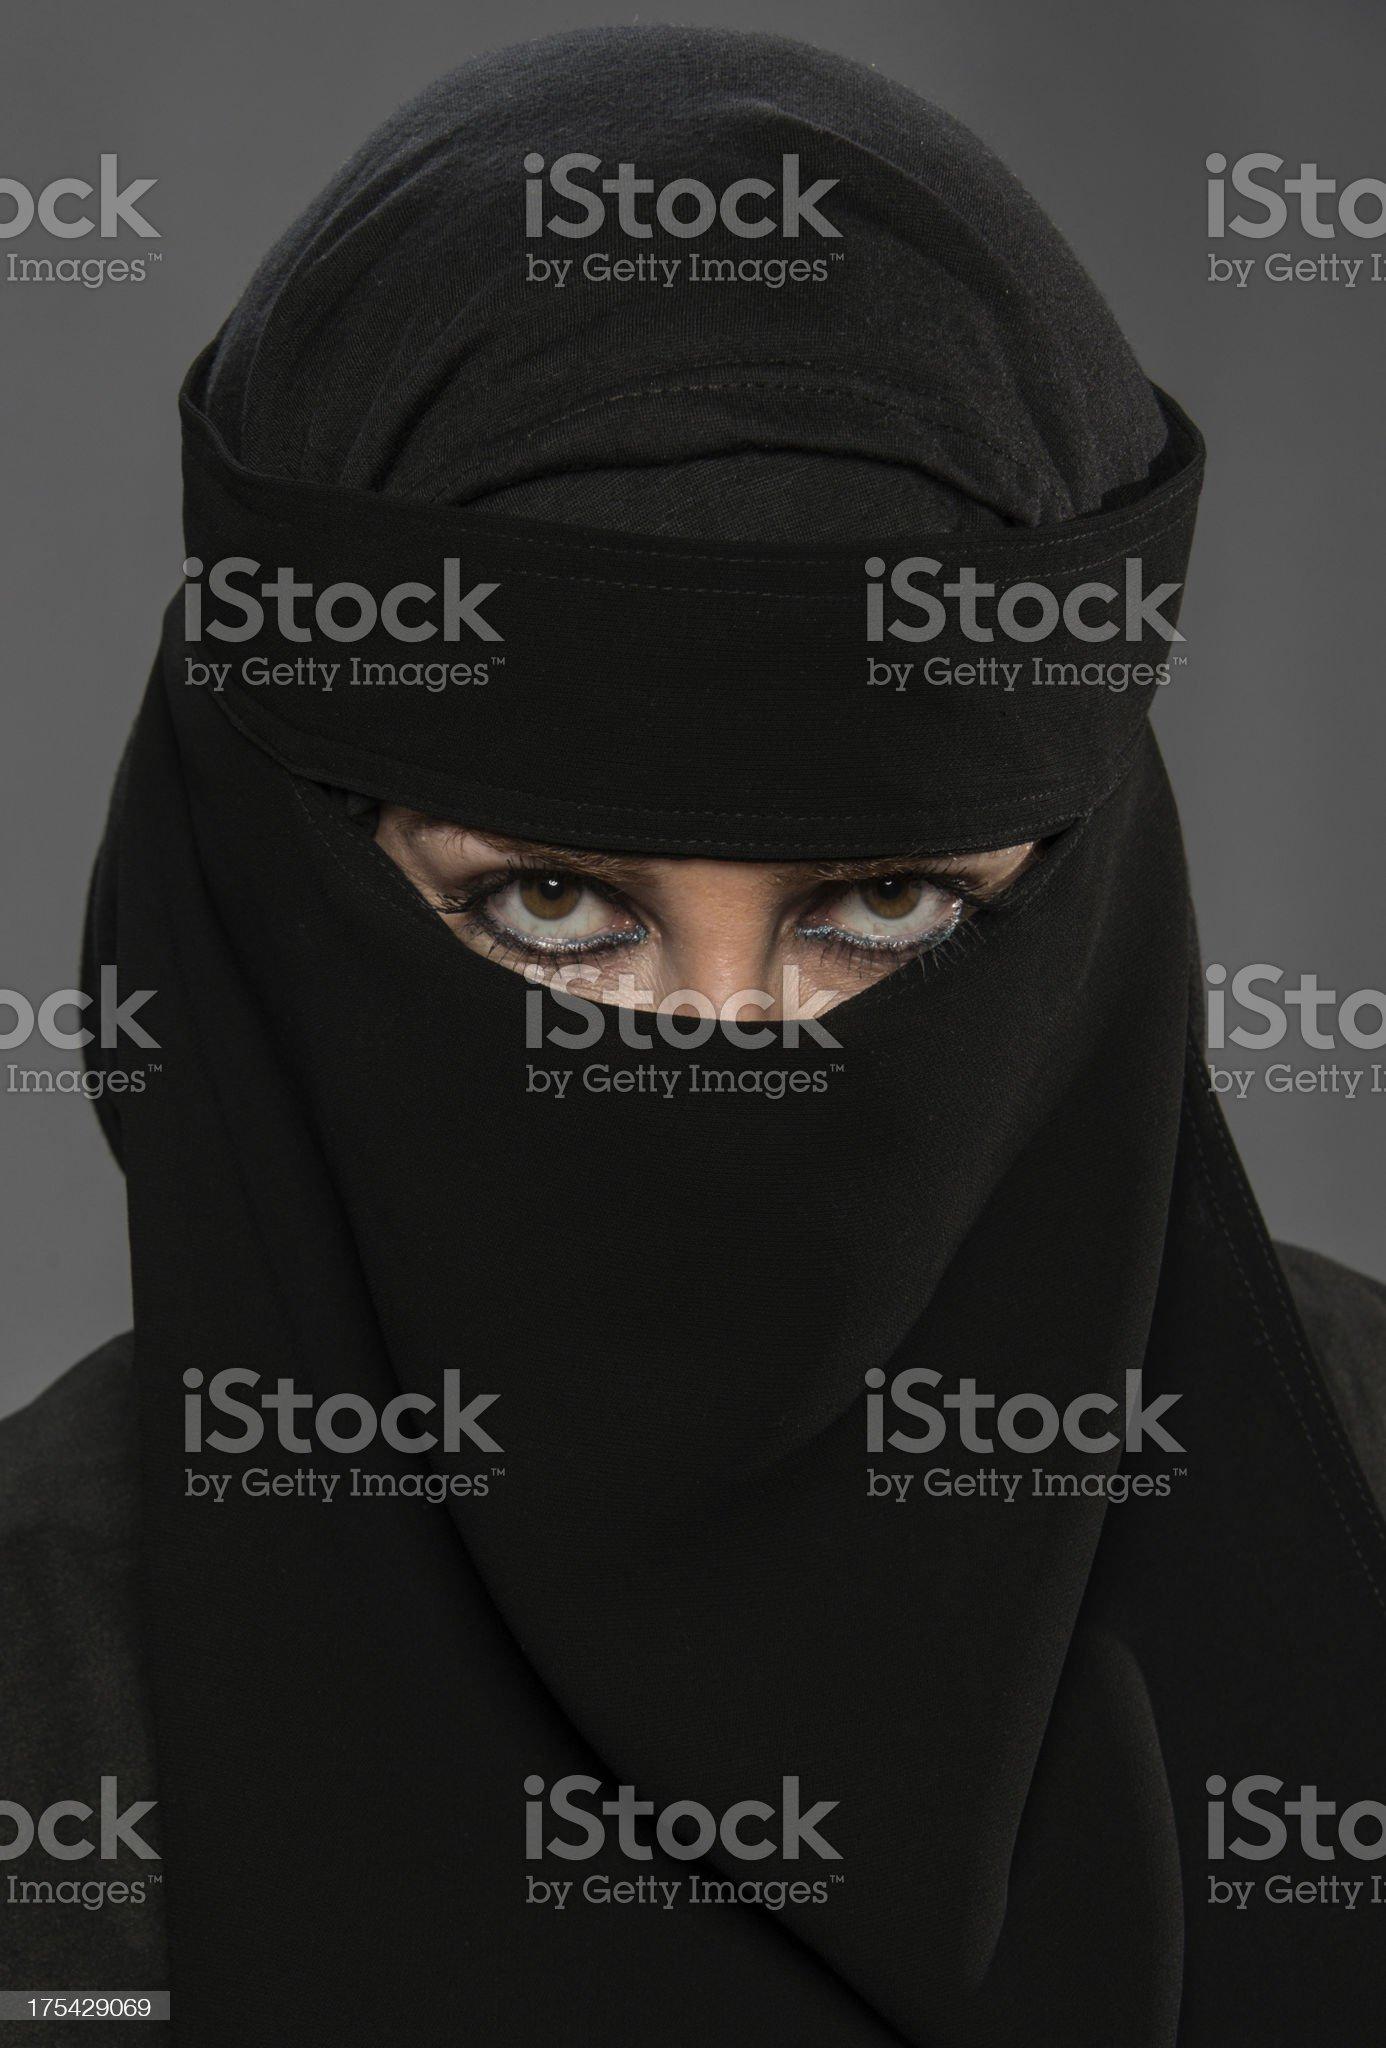 Muslim woman posing wearing a Burkha veil. royalty-free stock photo